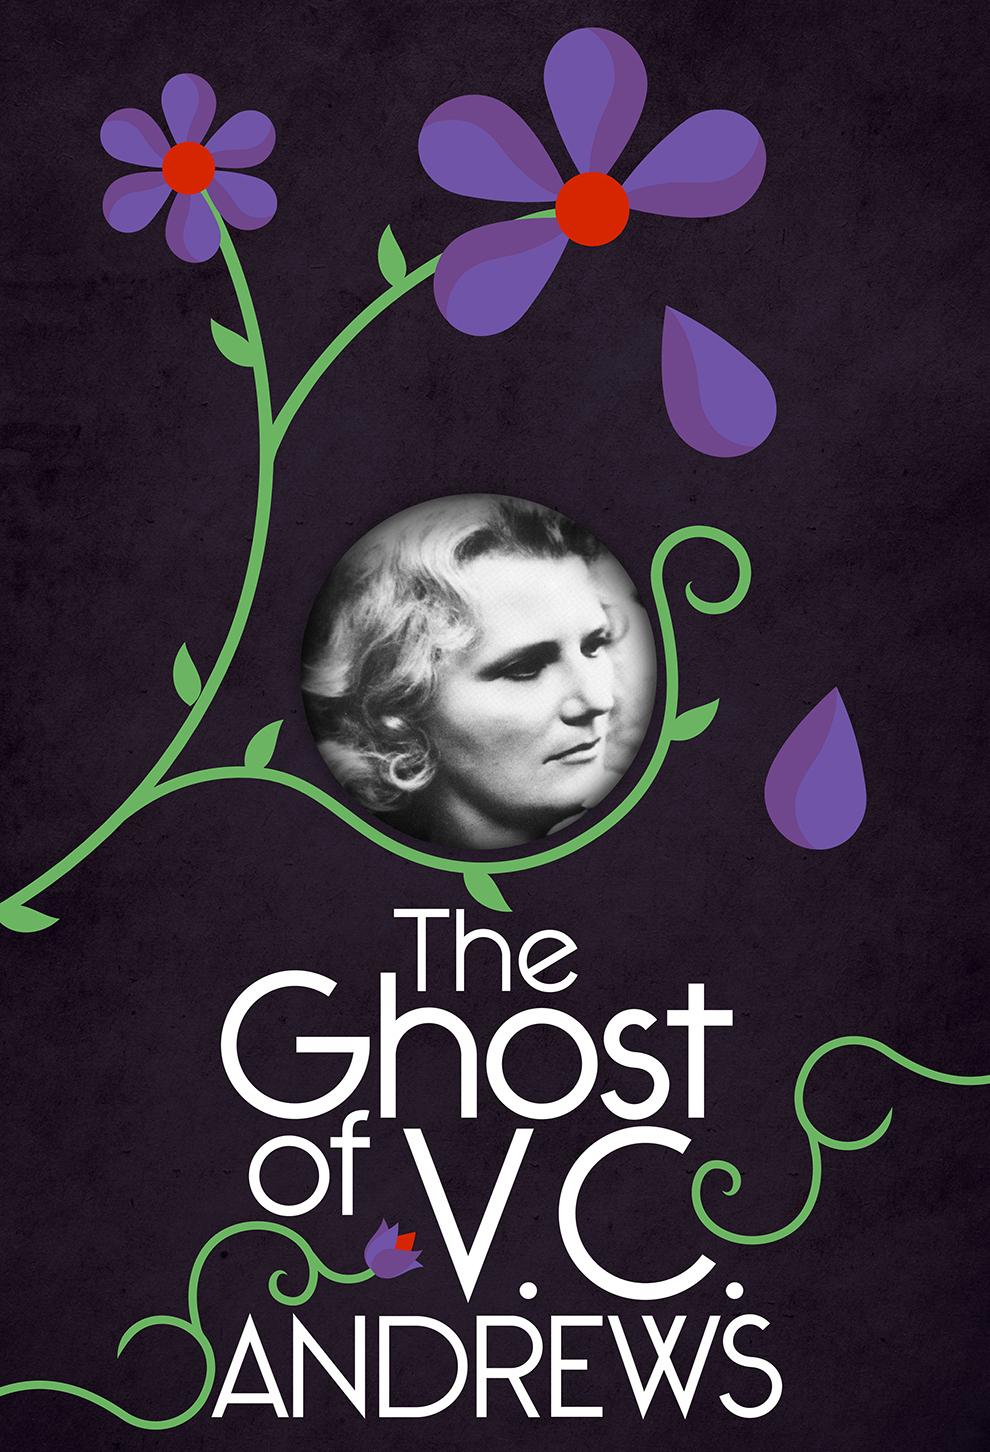 VC Andrews poster